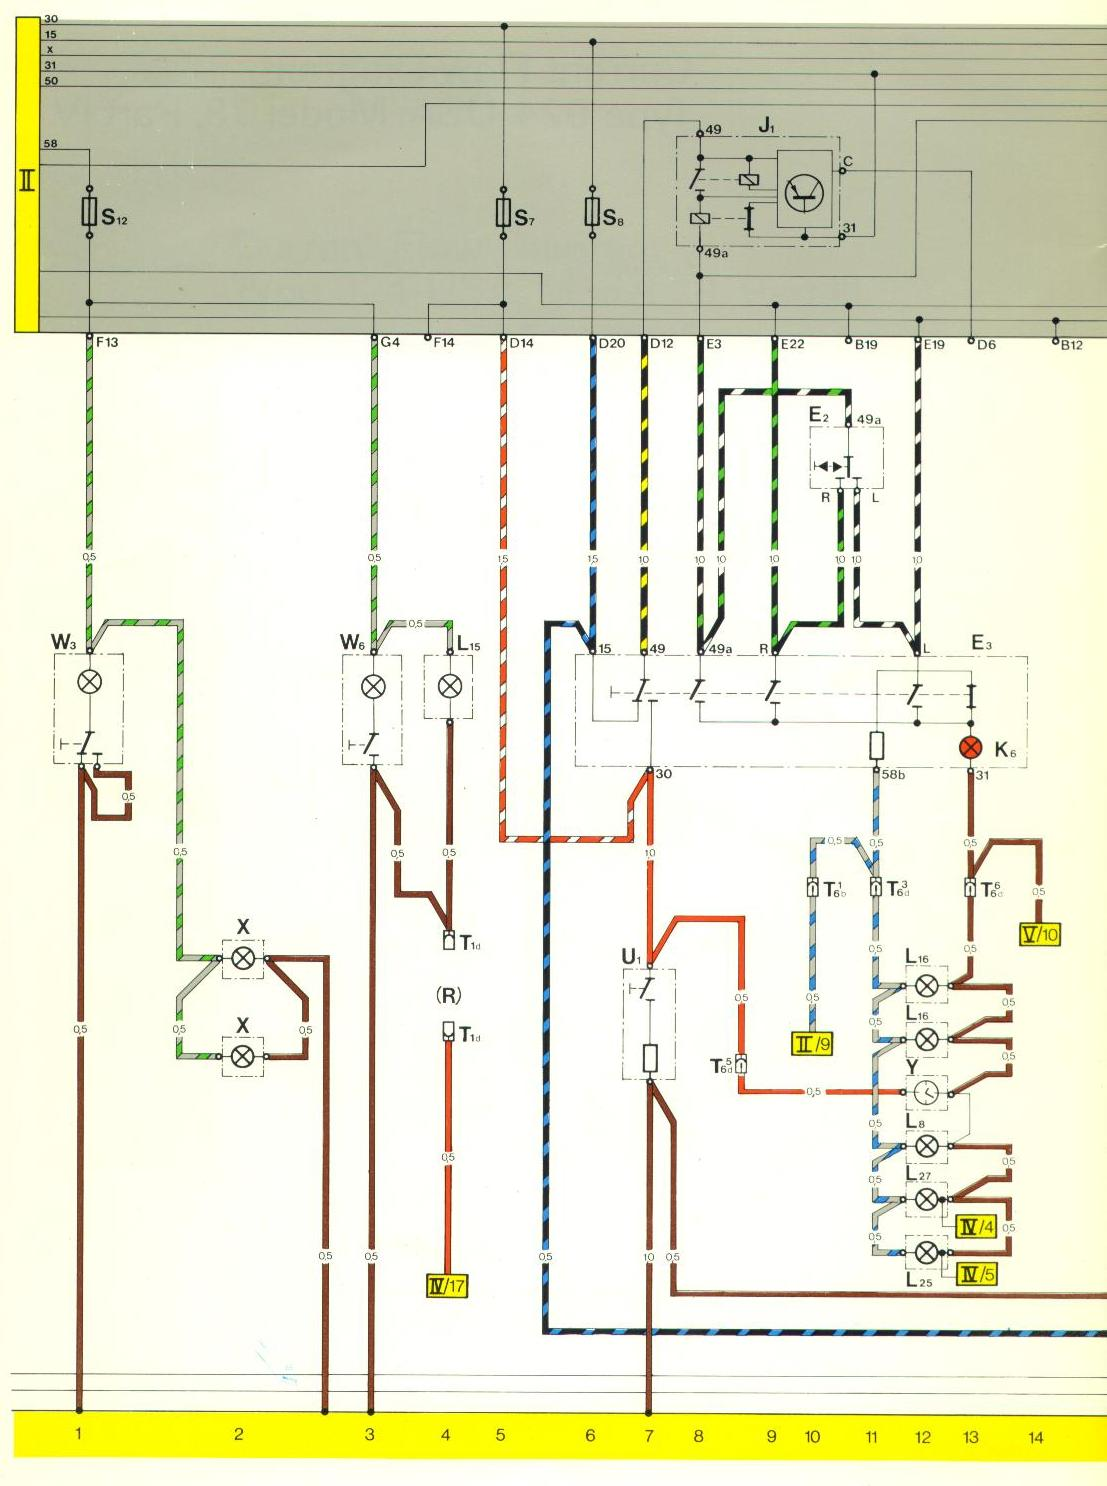 Awesome Porsche 928 Wiring Diagram oem wiring diagrams bytecc usa